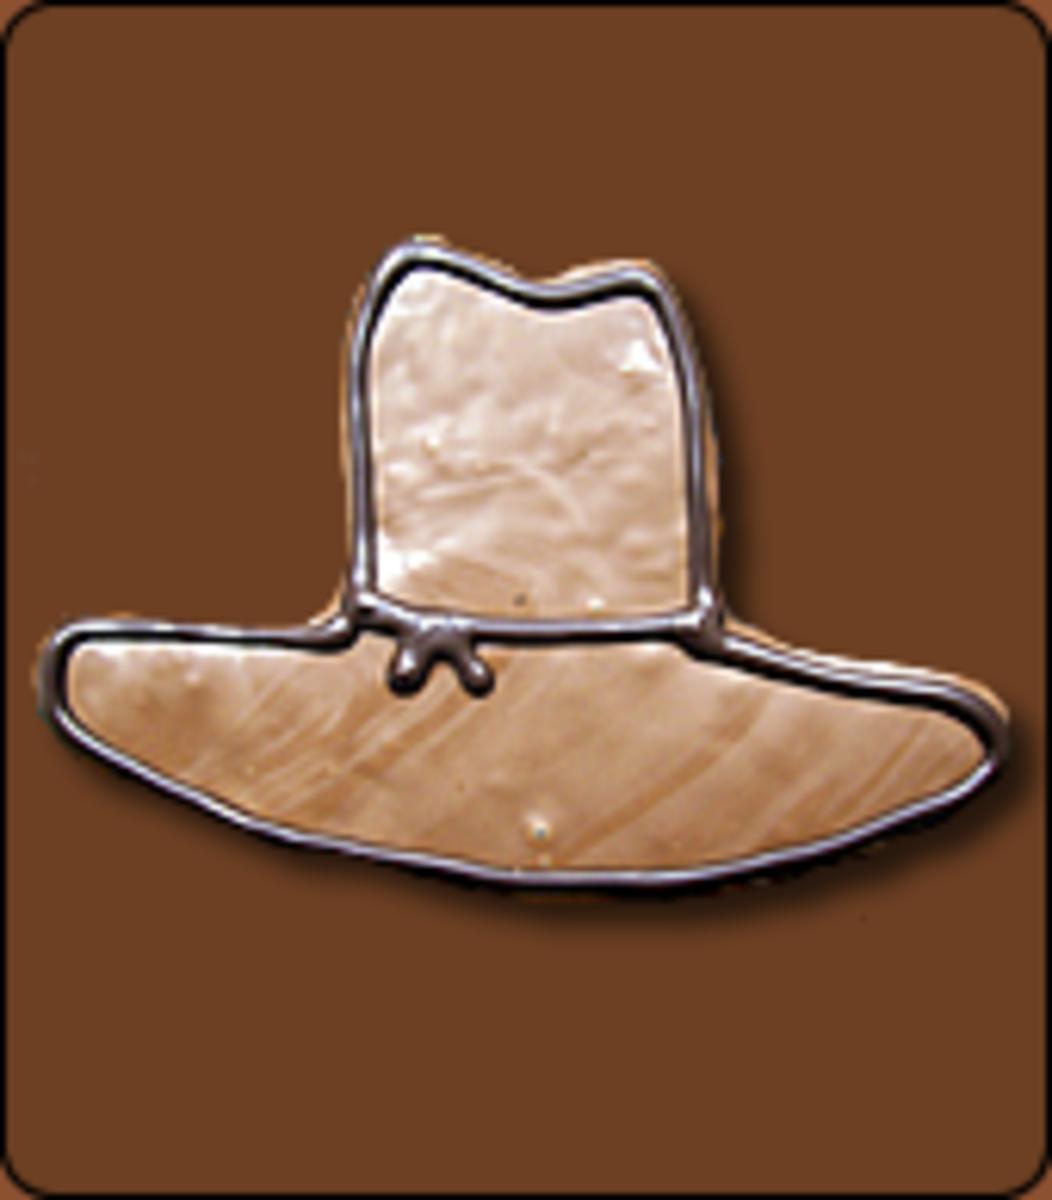 Chocolate Covered Rice Krispy Treat Cowboy Hat